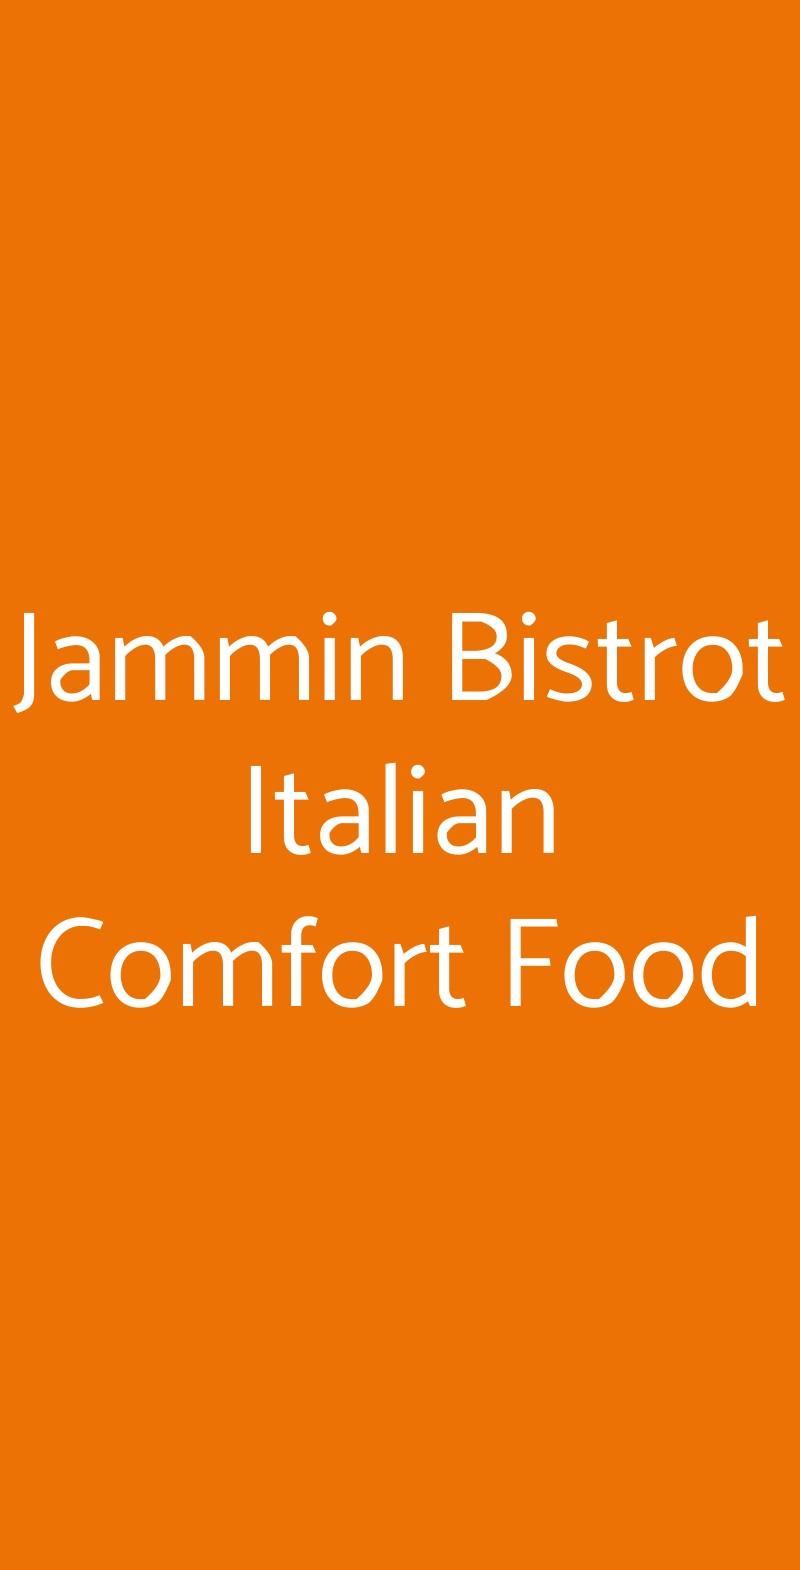 Jammin Bistrot Italian Comfort Food Napoli menù 1 pagina